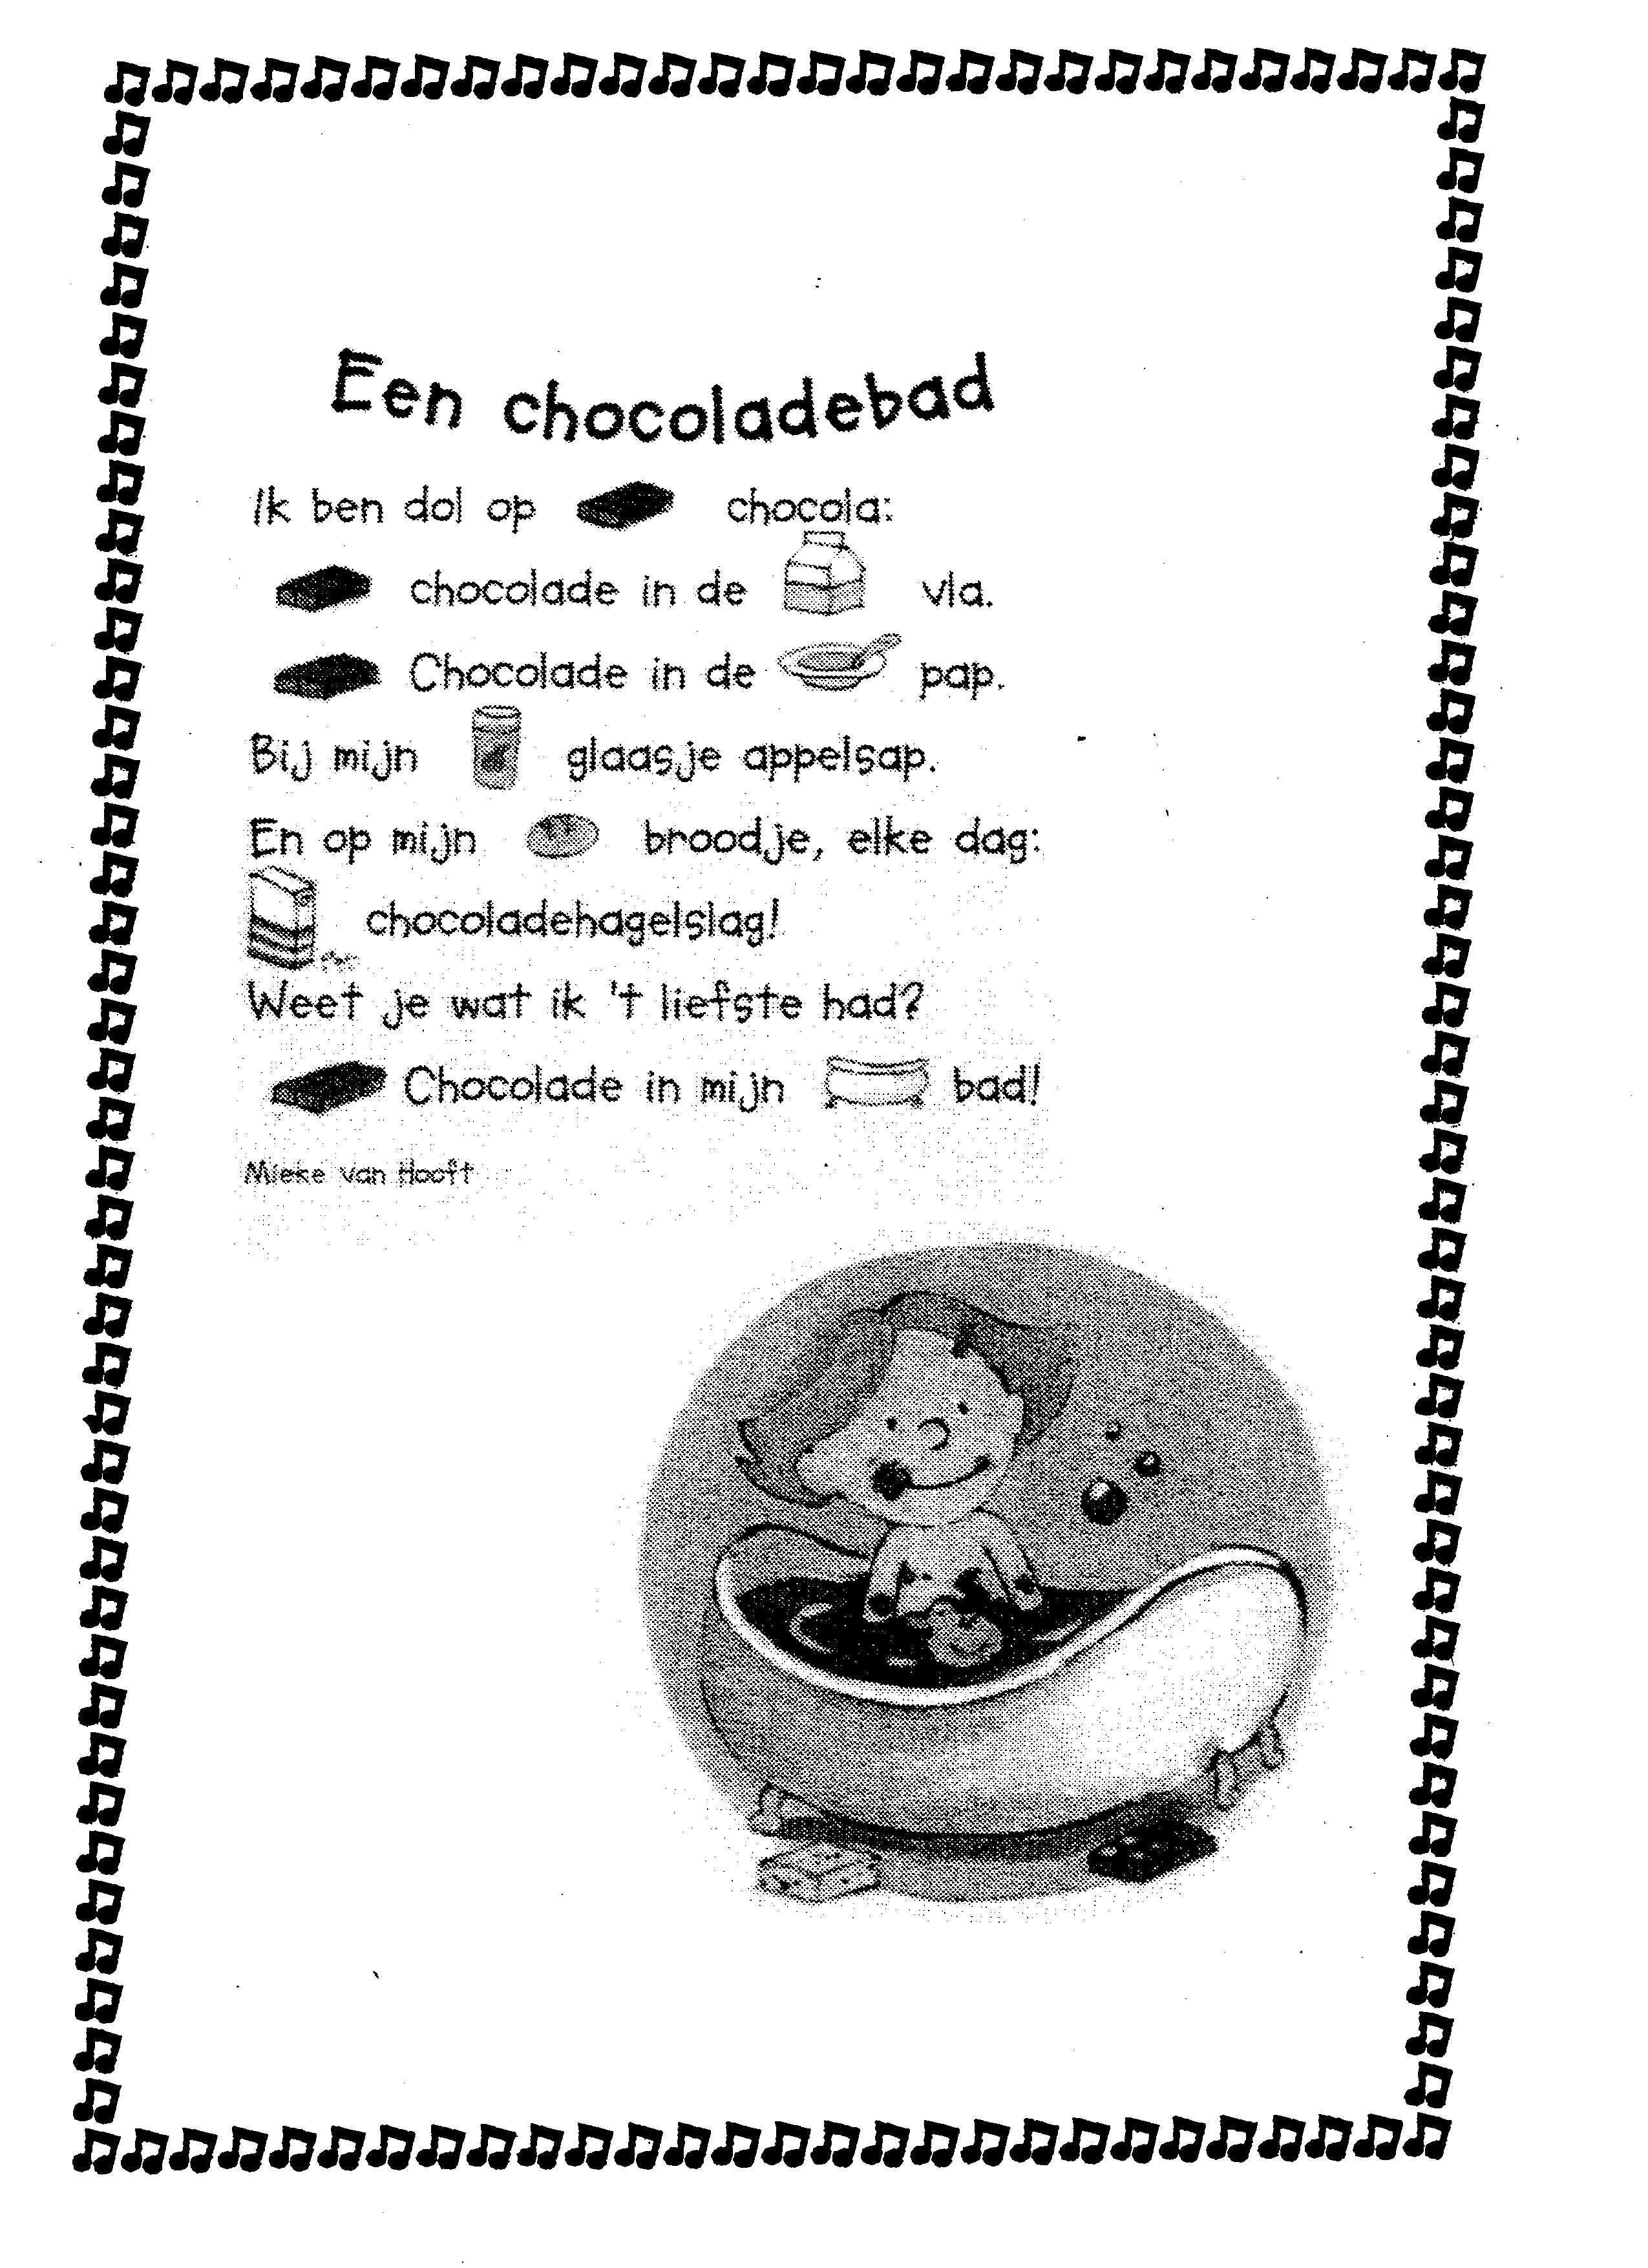 Versje Chocoladebad